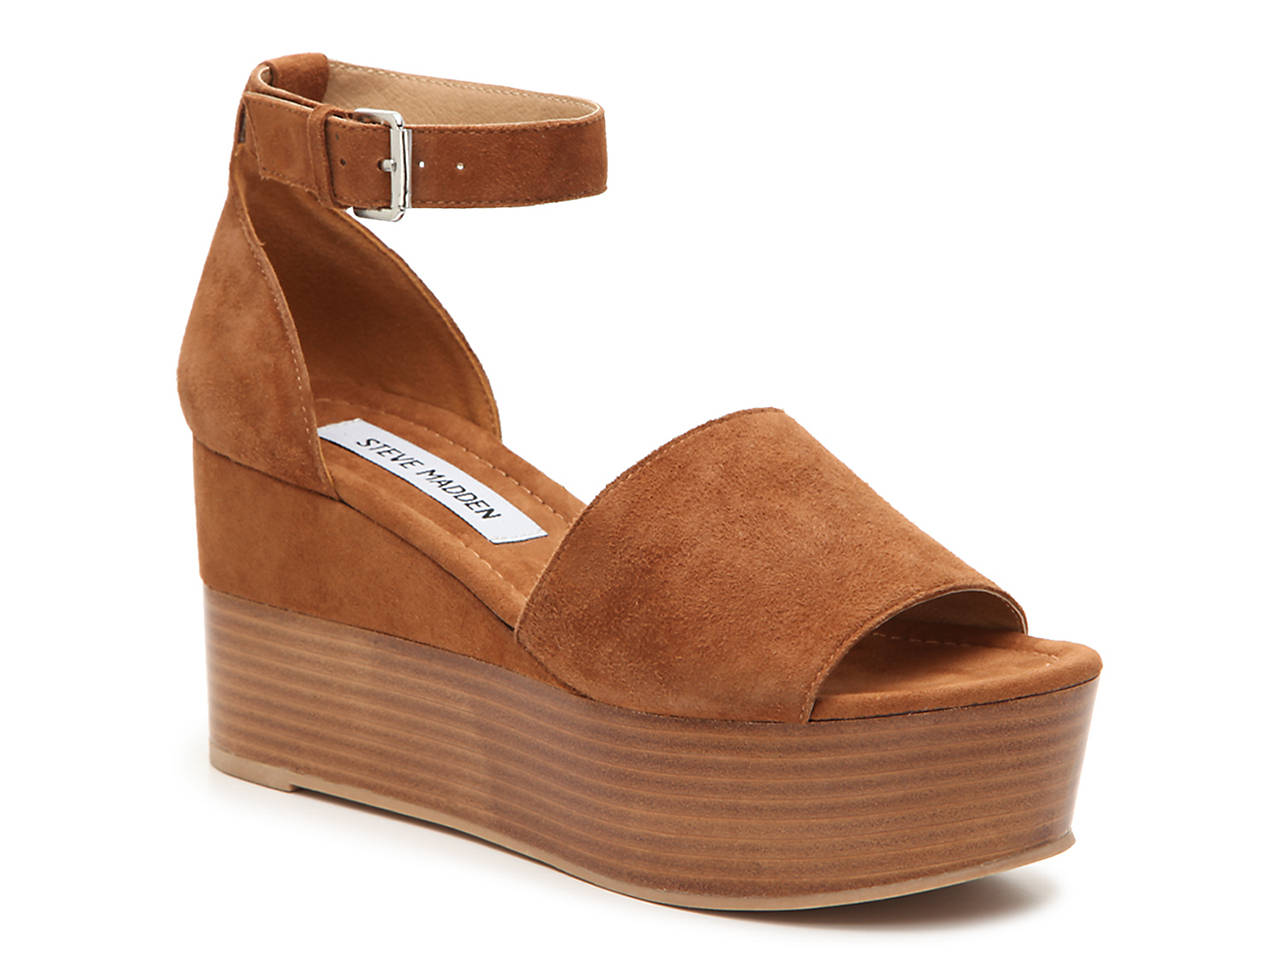 01e484bdb11 Steve Madden Zala Wedge Sandal Women s Shoes